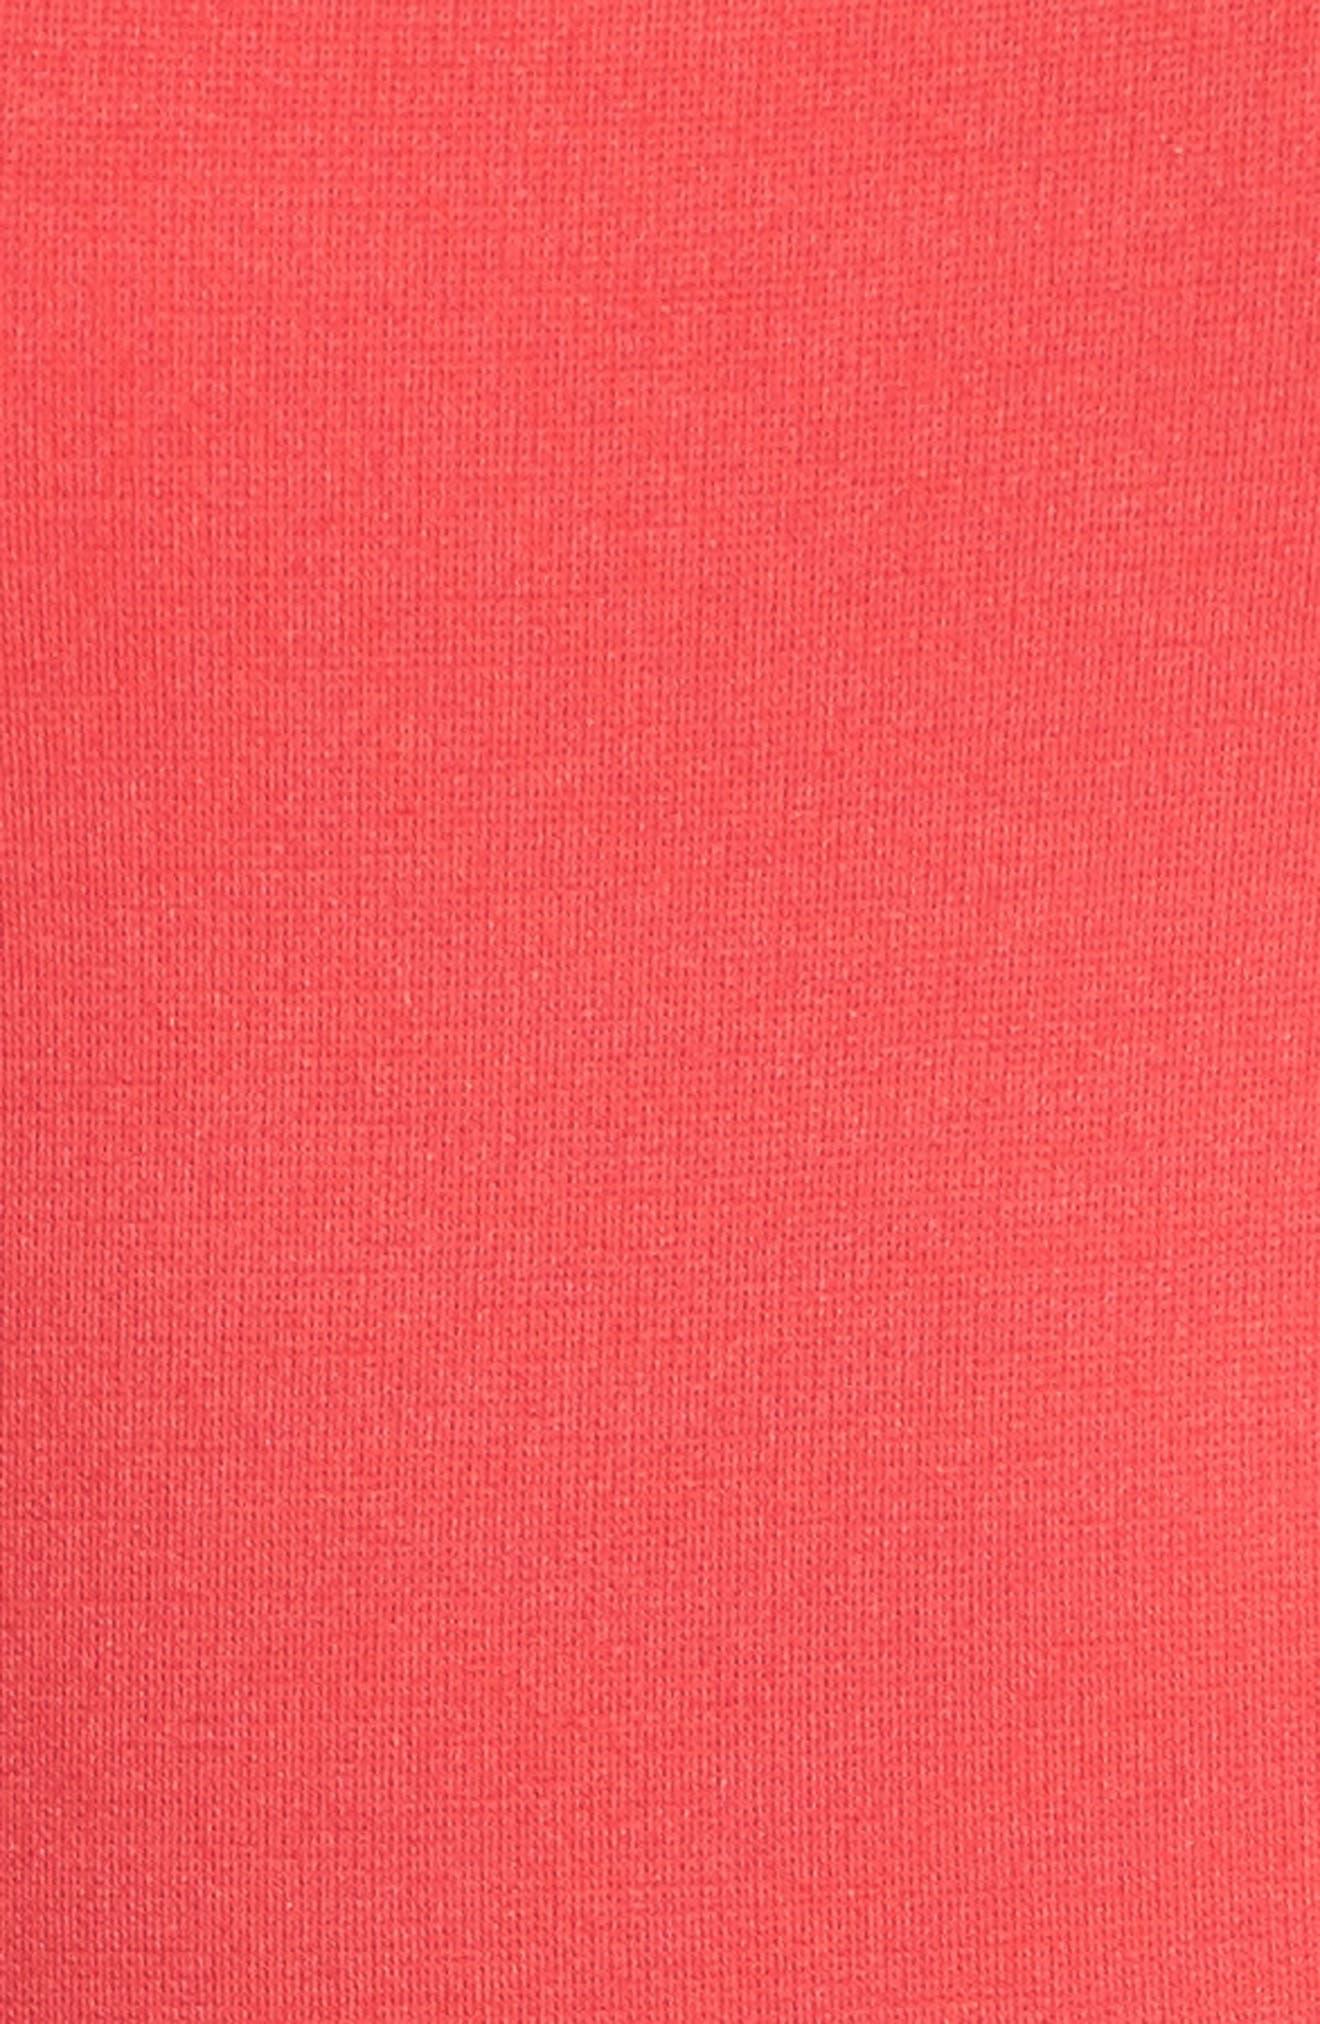 Stretch Knit Midi Dress,                             Alternate thumbnail 53, color,